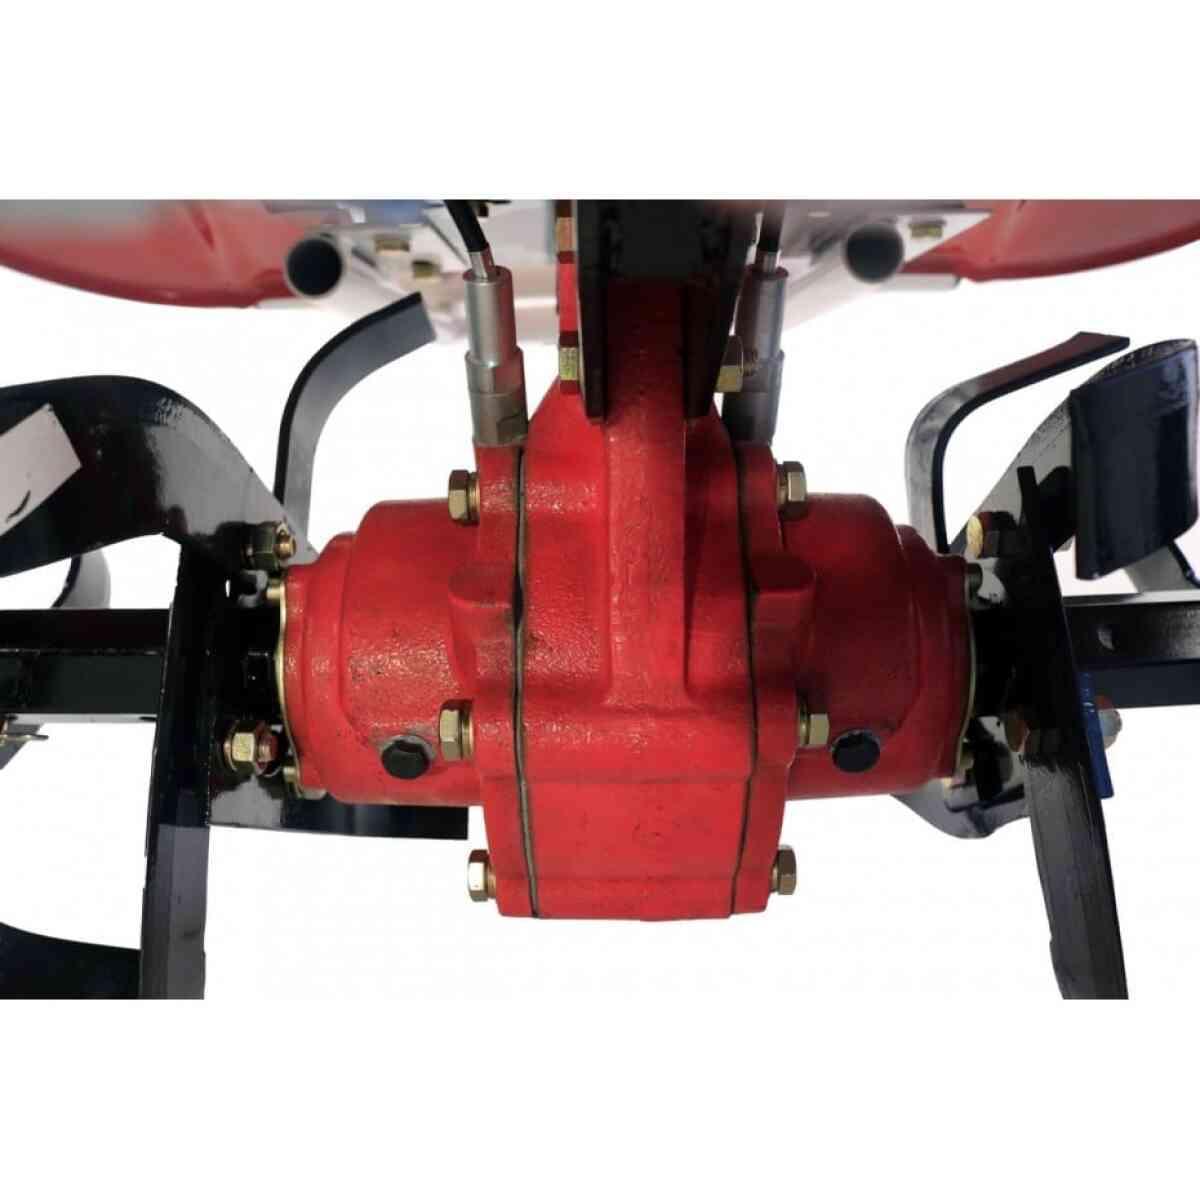 motocultor pro series new 1350 s o mac.ro 4 1 54